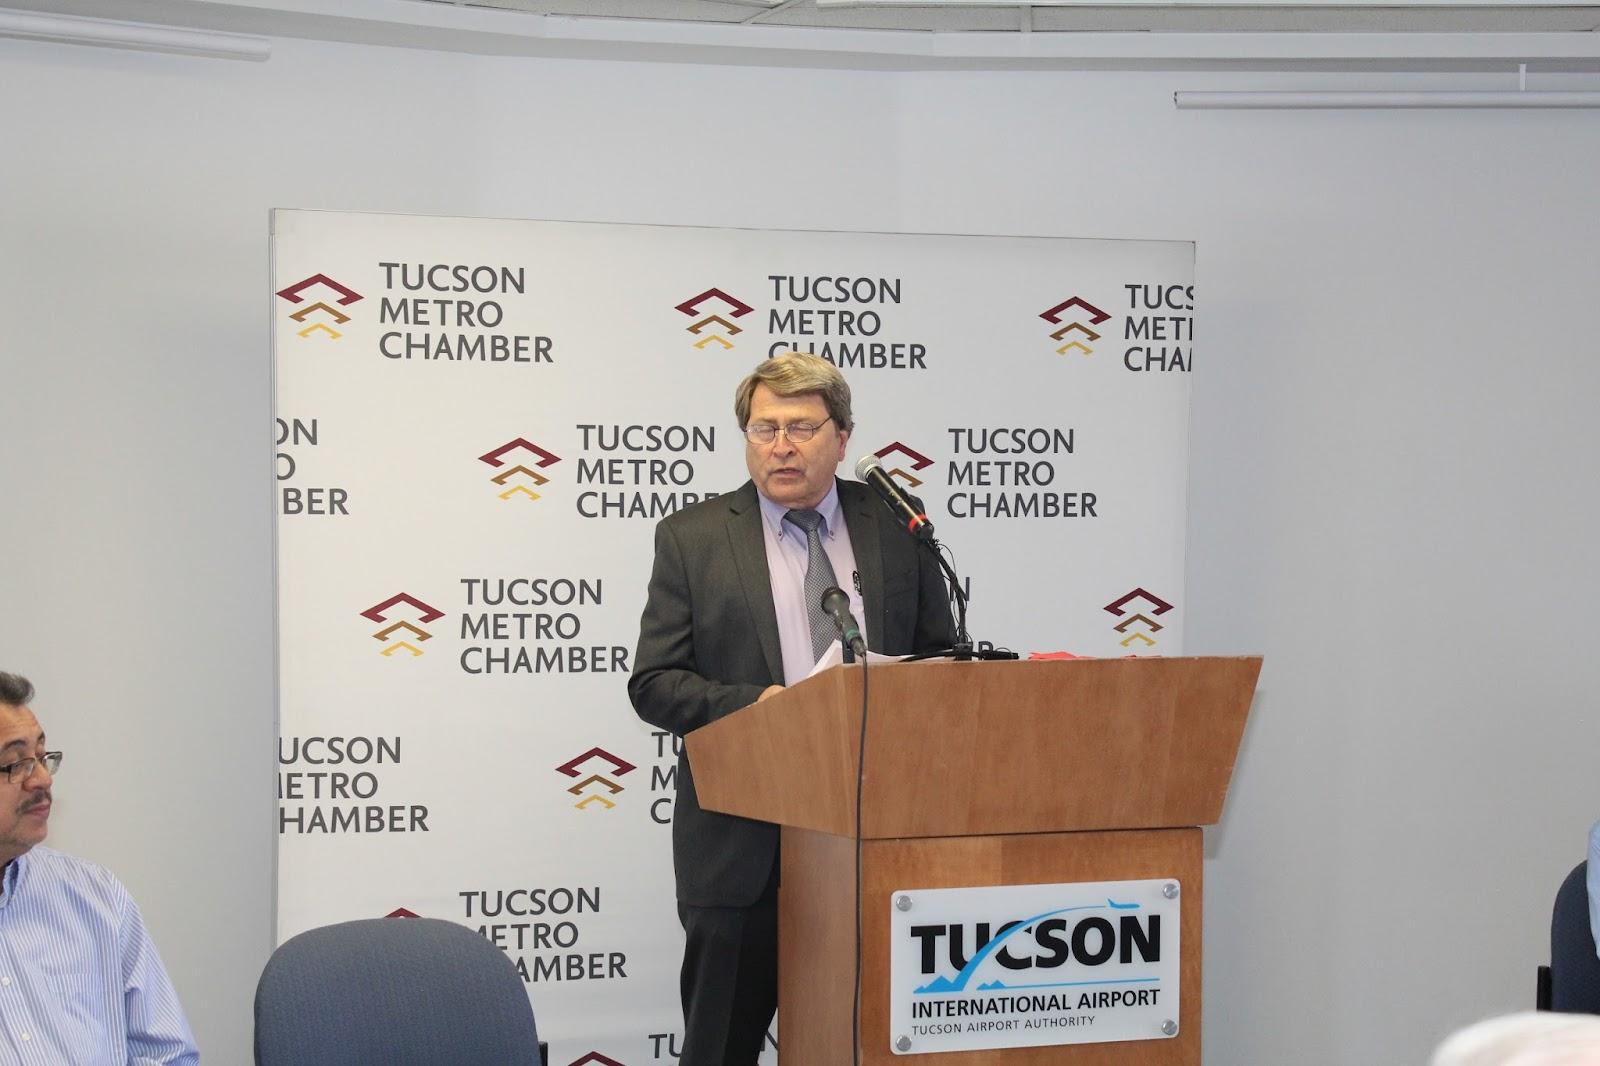 Tucson - JFK Non-Stop Route Announcement - IMG_3168.JPG